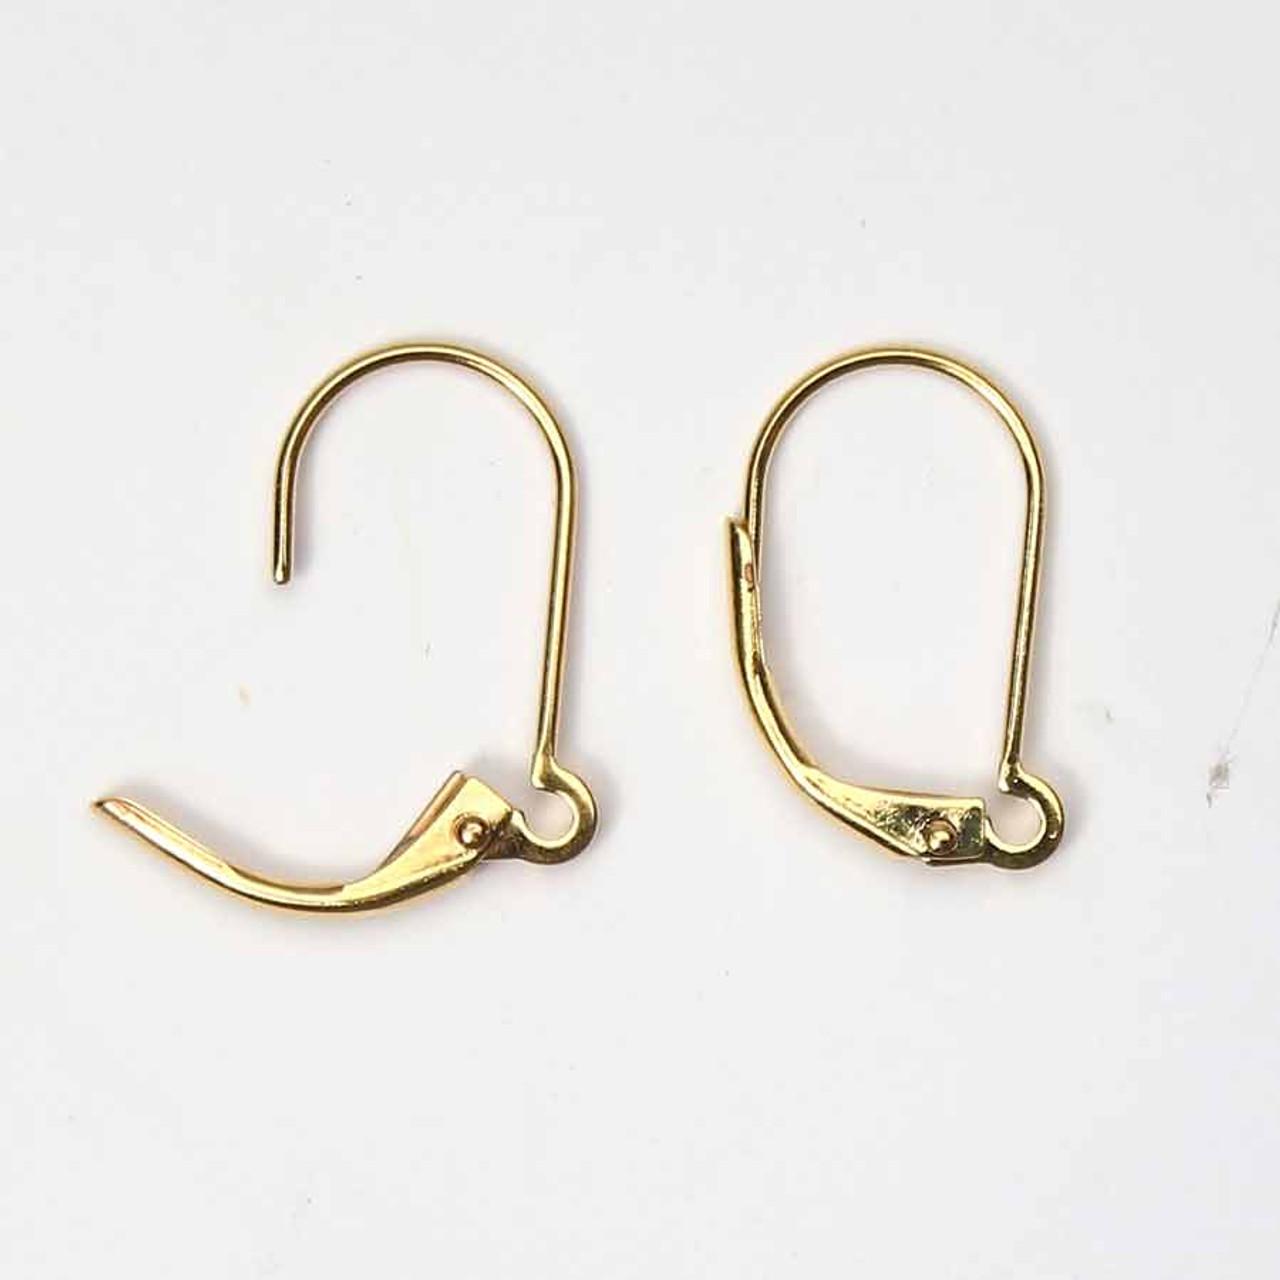 10pc 5 PR Lot 925 Sterling Silver Filled OPEN LOOP EURO Lever Earrings Finding